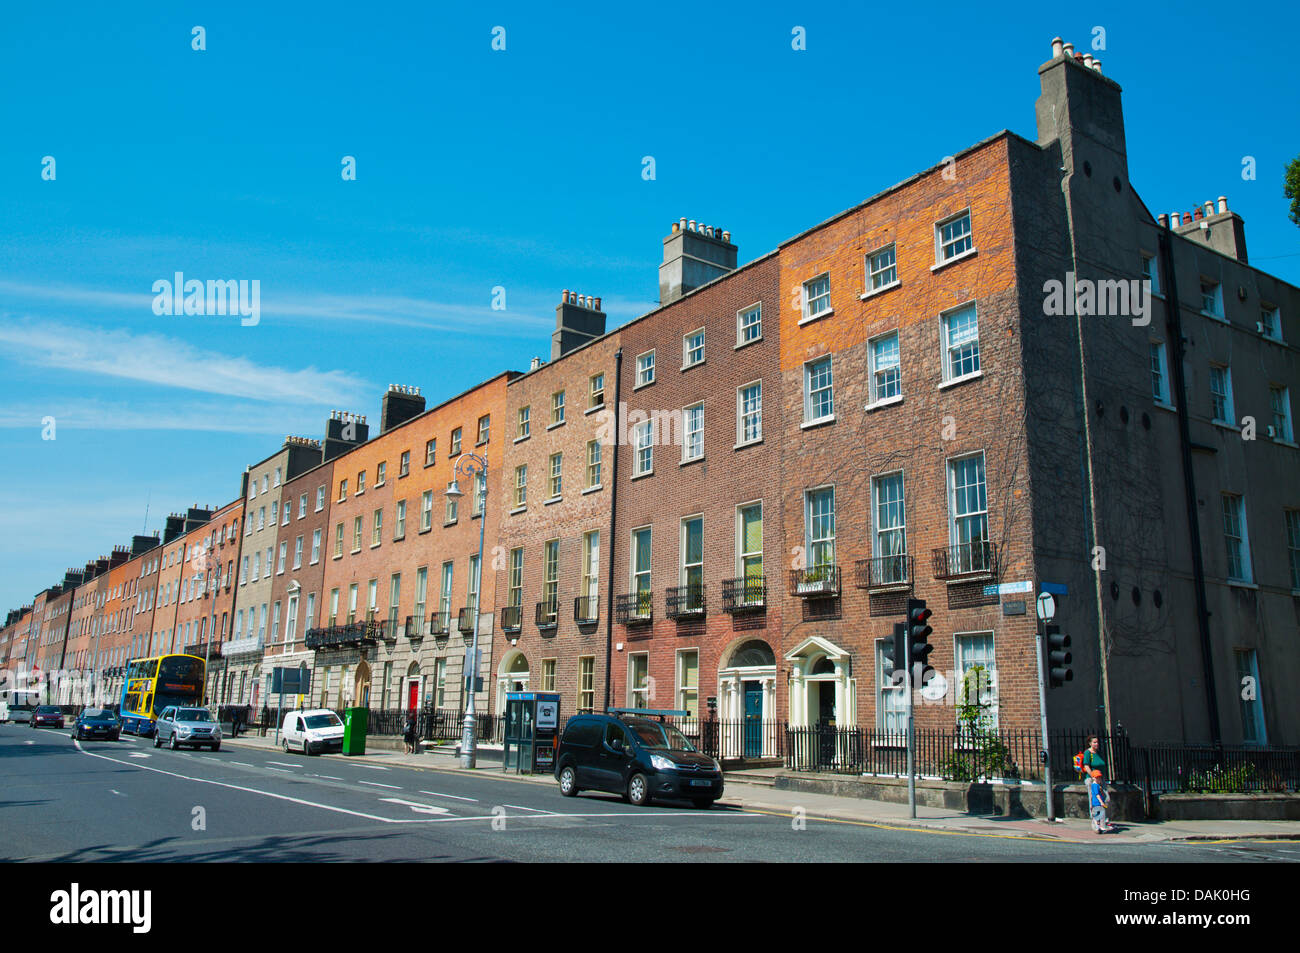 Merrion Square central Dublin Ireland Europe - Stock Image